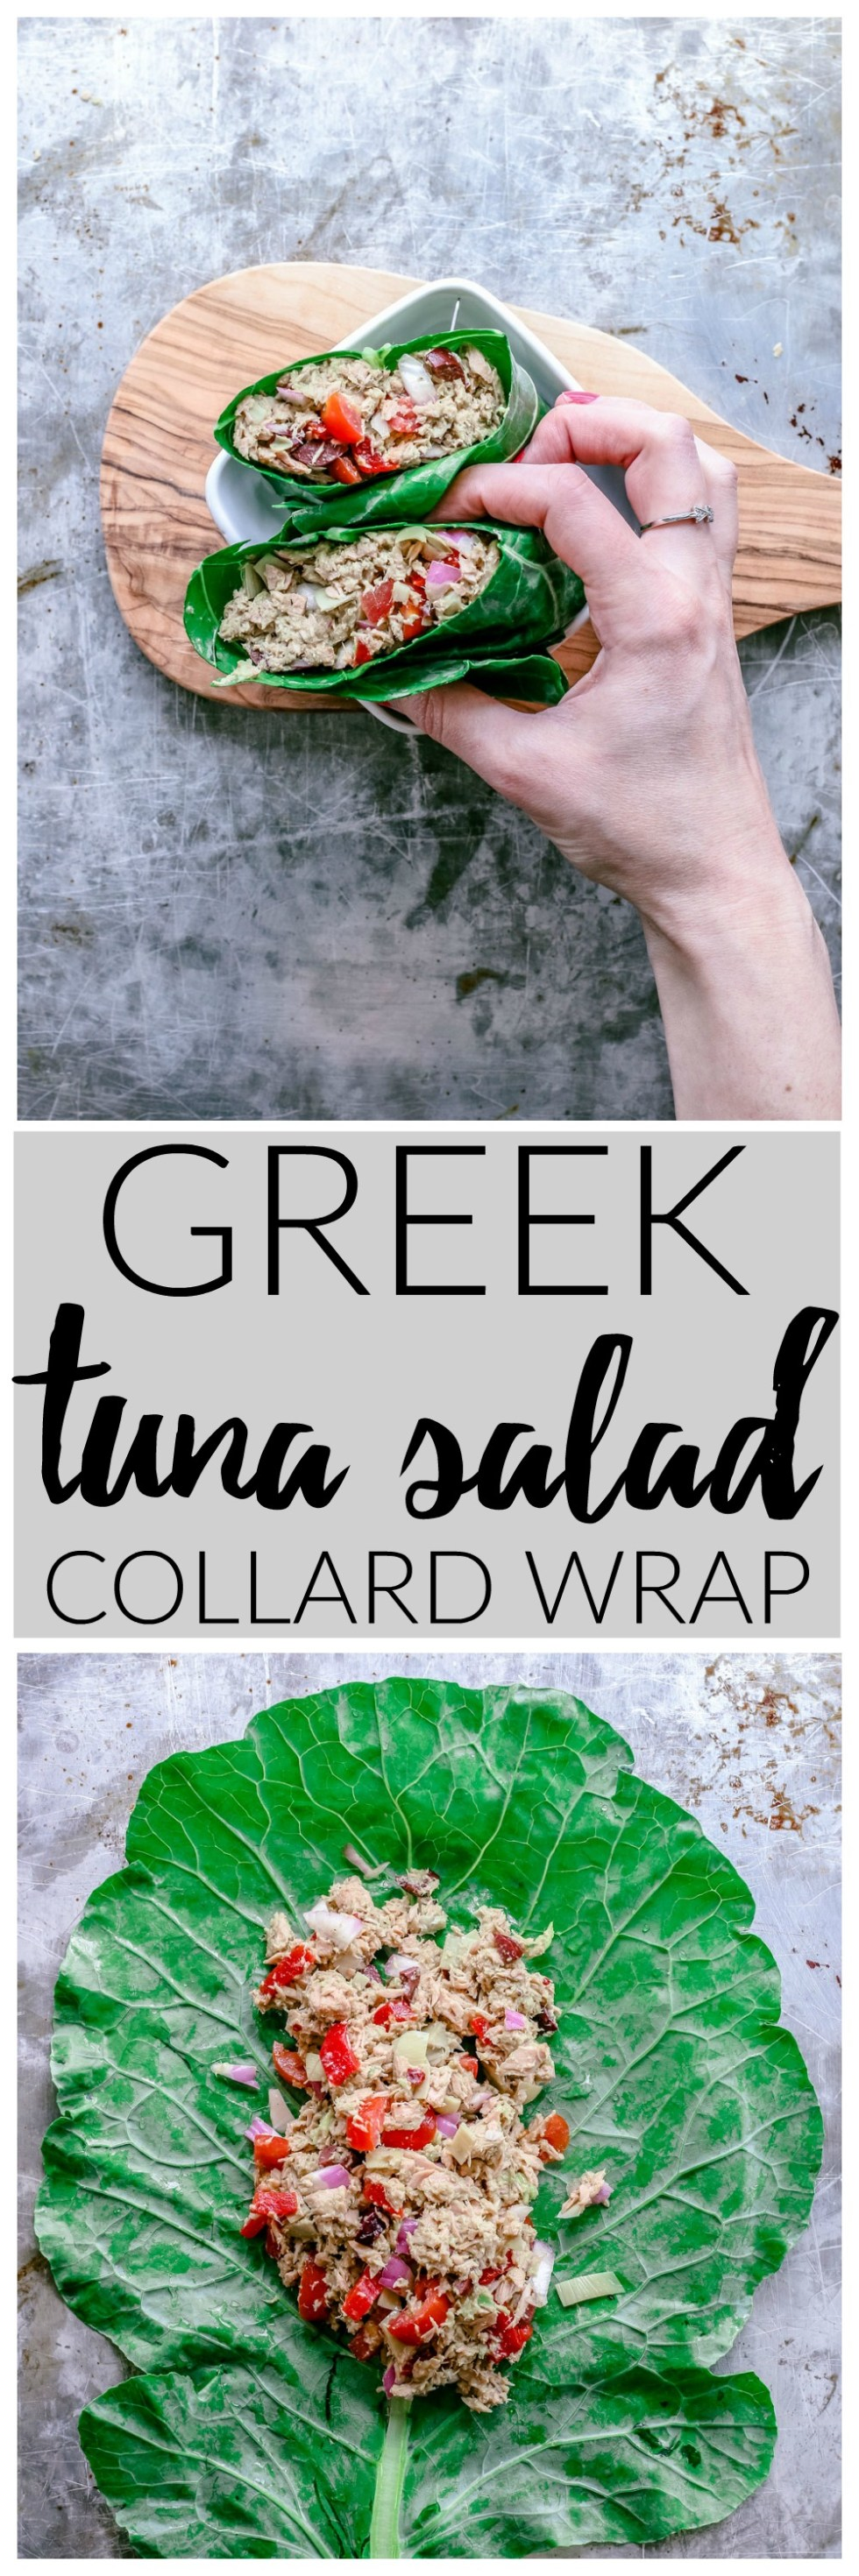 Greek Tuna Salad Collard Wrap   Killing Thyme